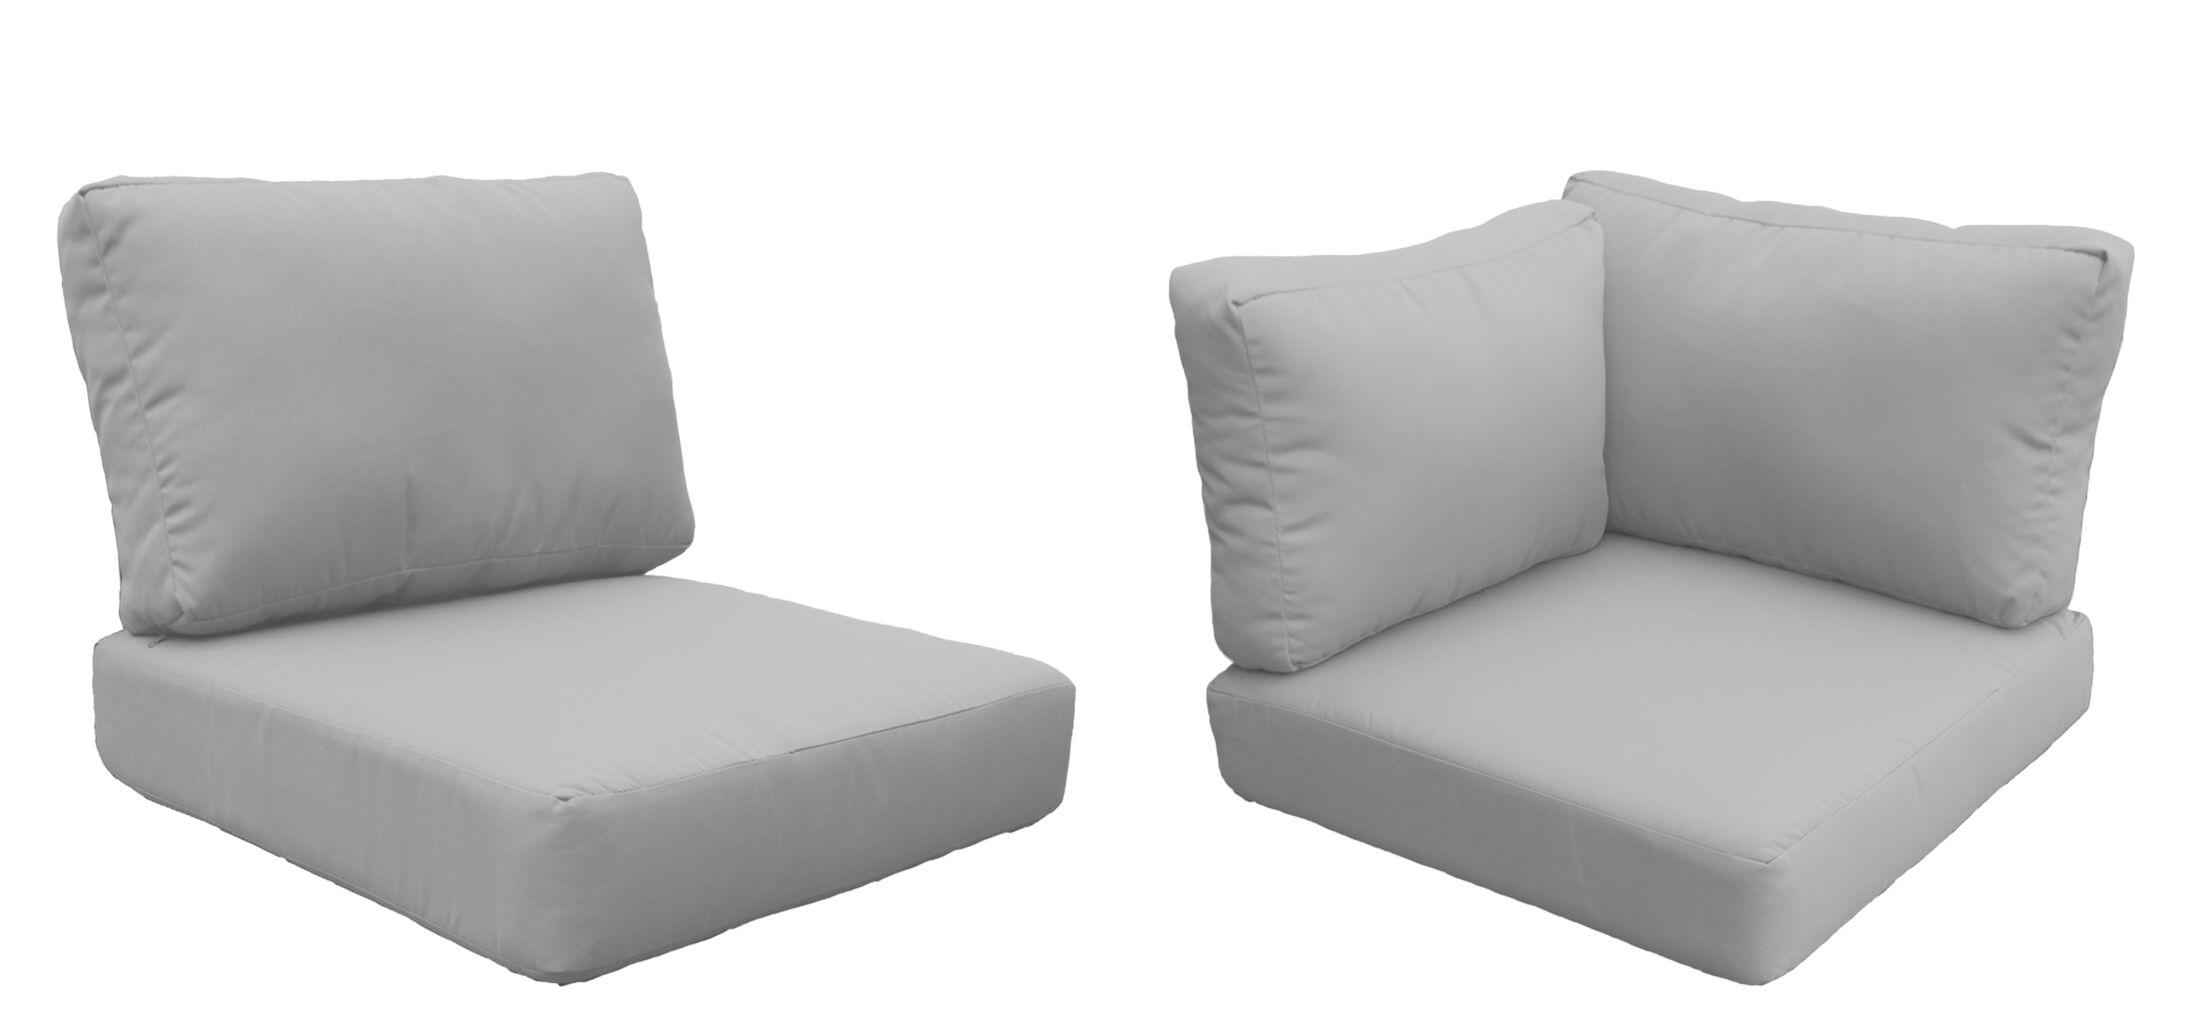 Fairmont 14 Piece Outdoor�Lounge Chair Cushion Set Fabric: Beige